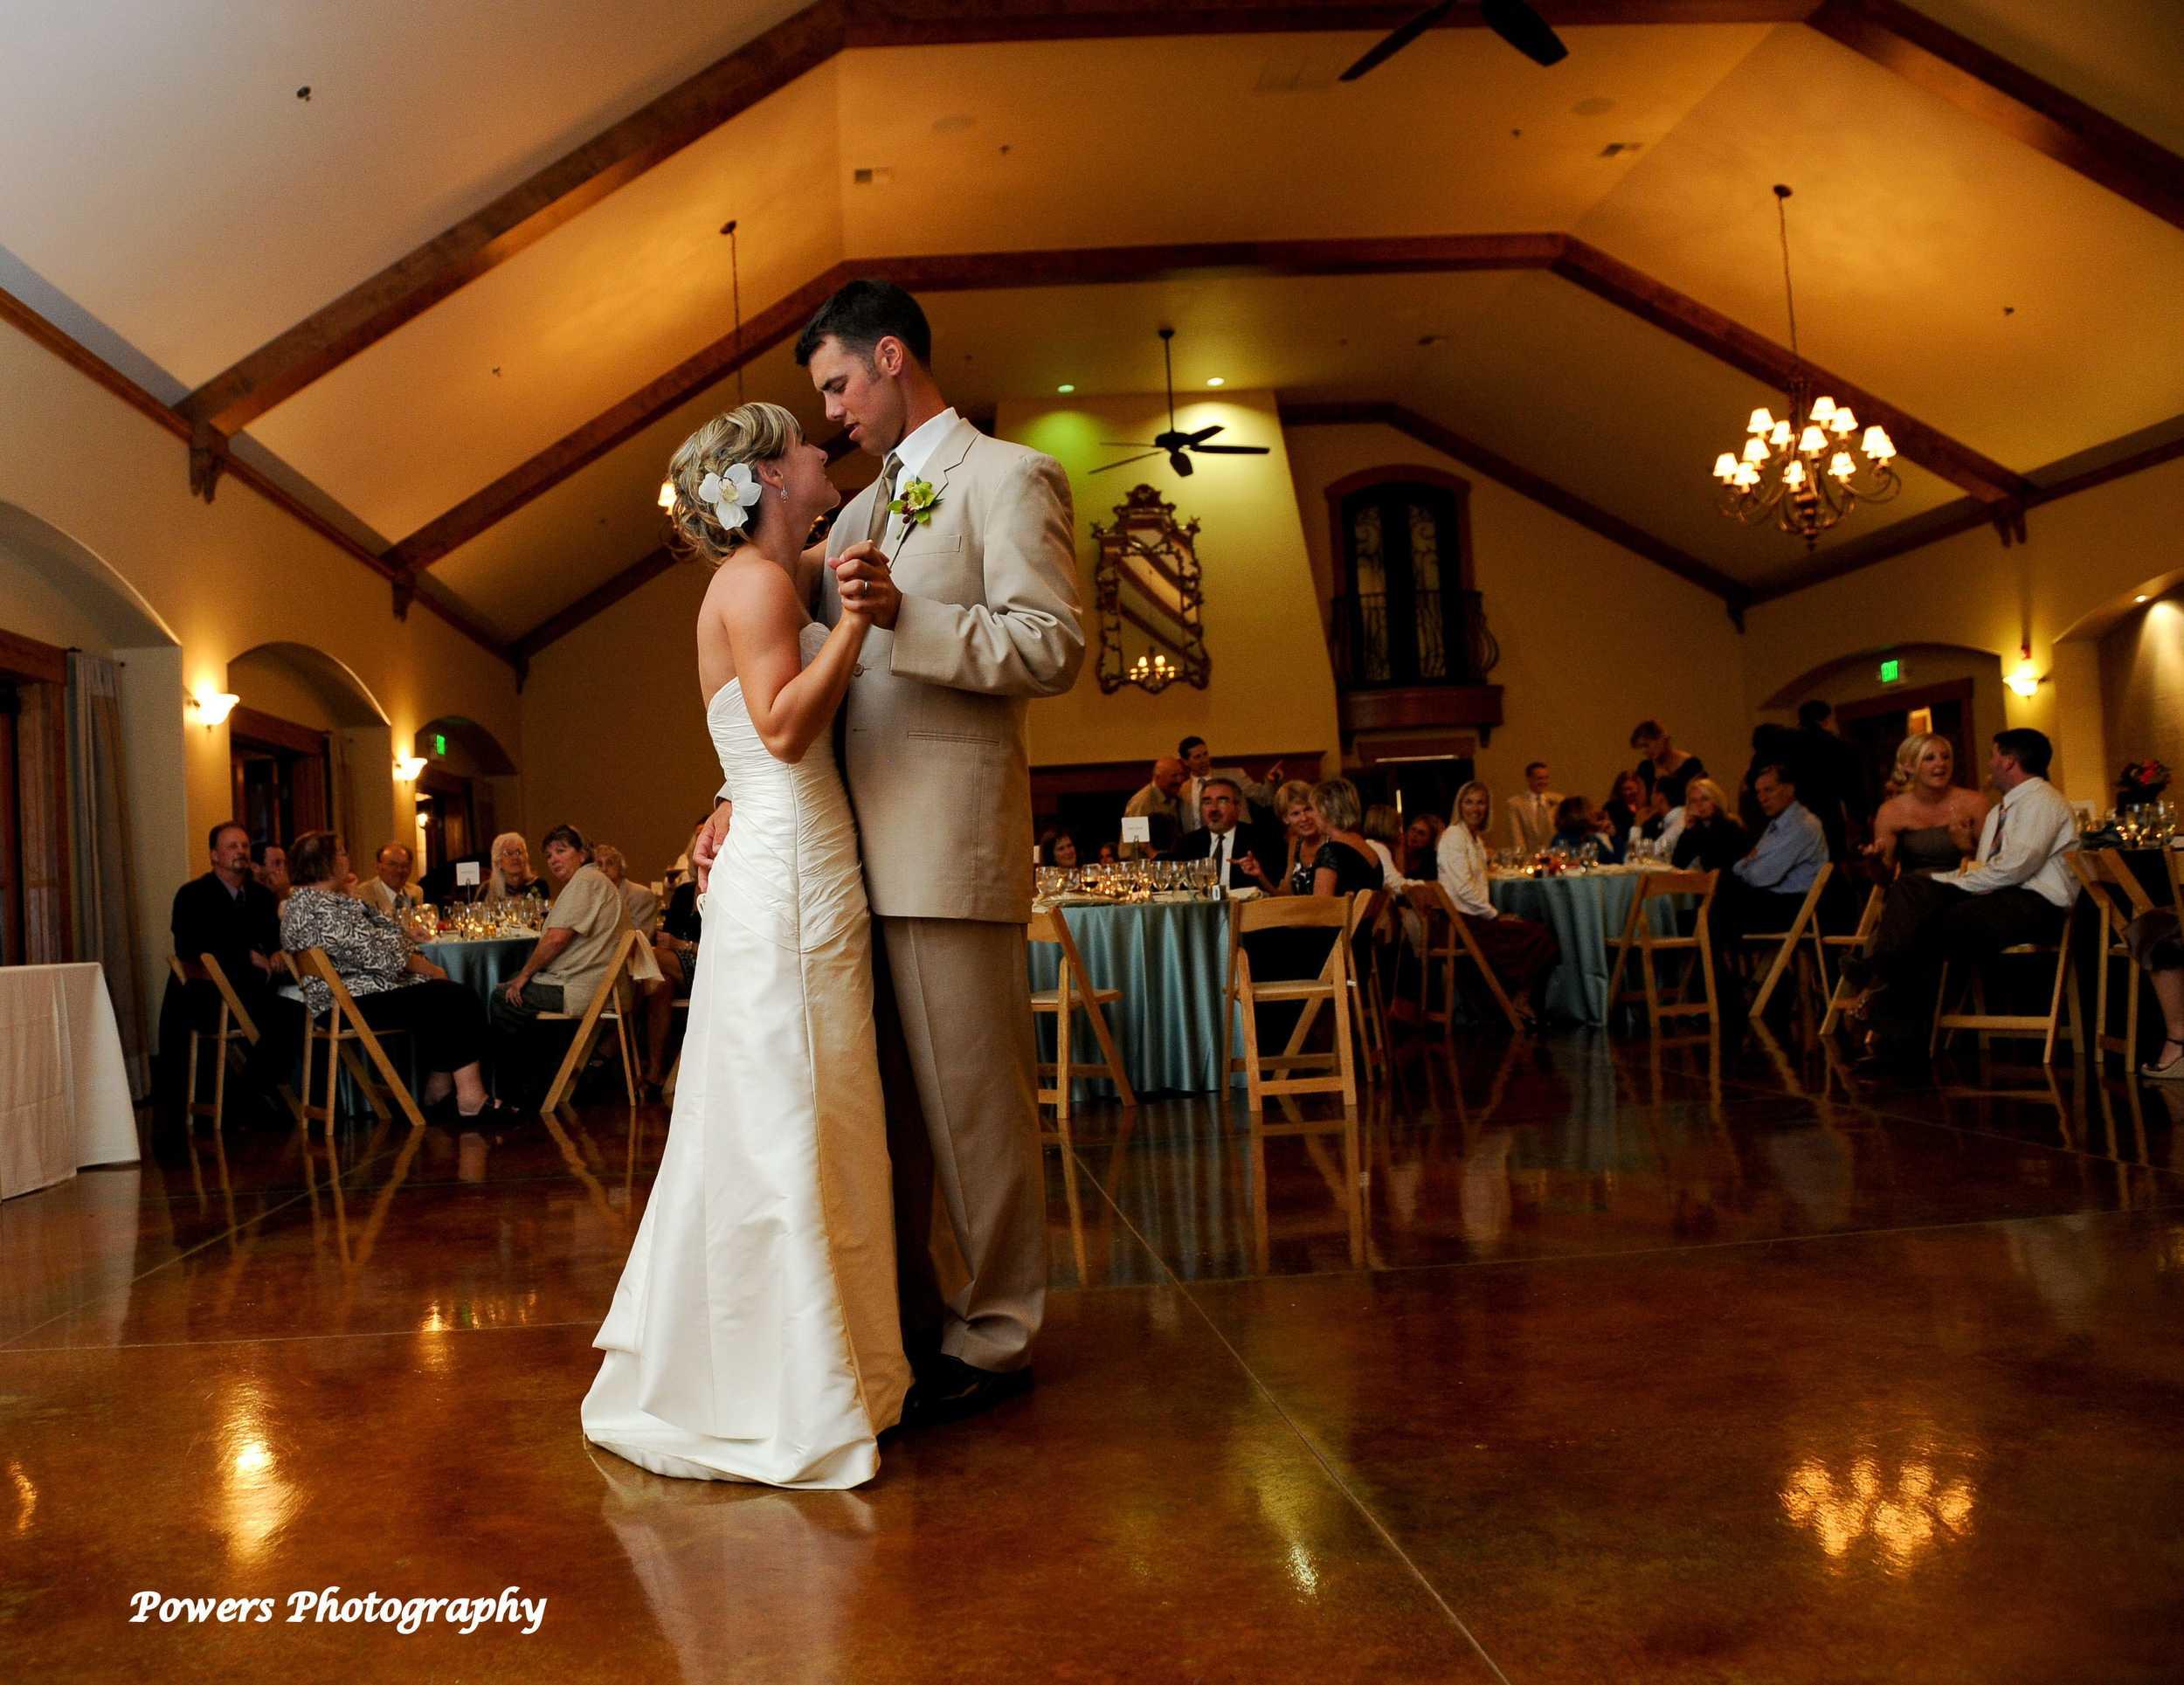 PowersPhotographyStudios275-min.jpg